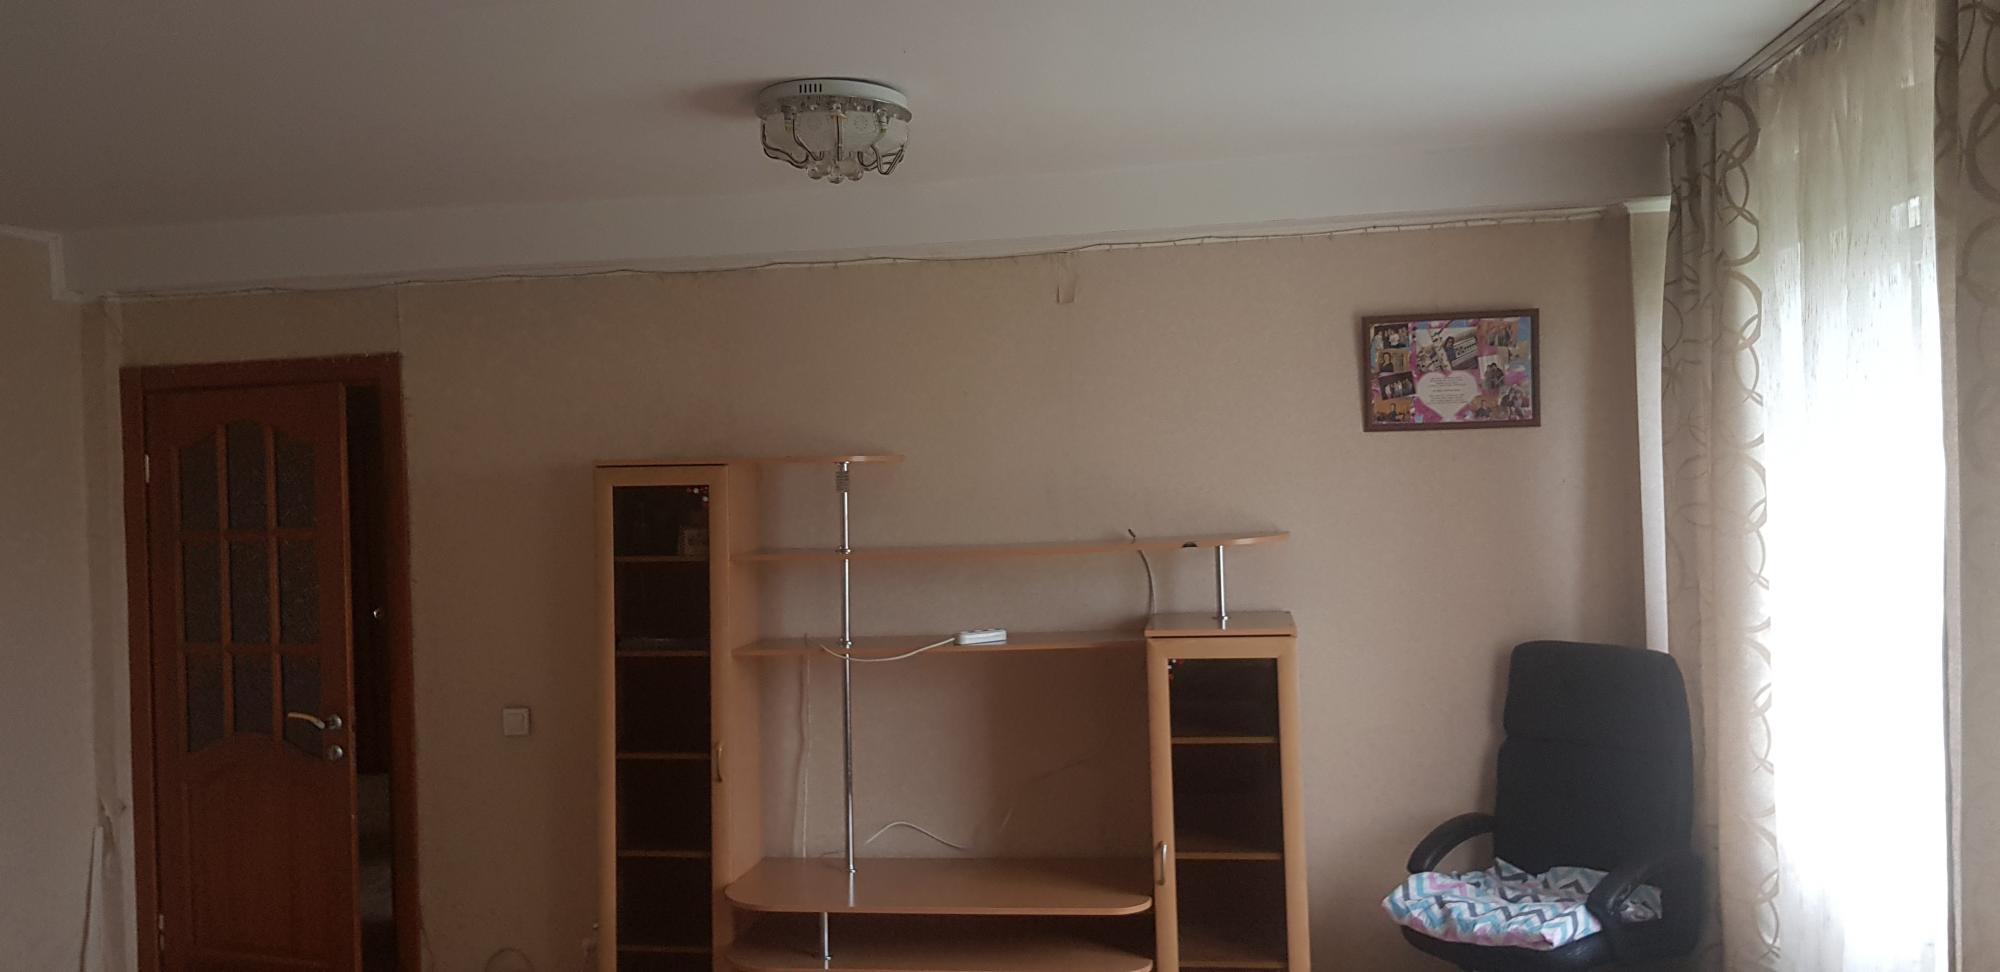 2к квартира улица Краснодарская, 3 | 18000 | аренда в Красноярске фото 9